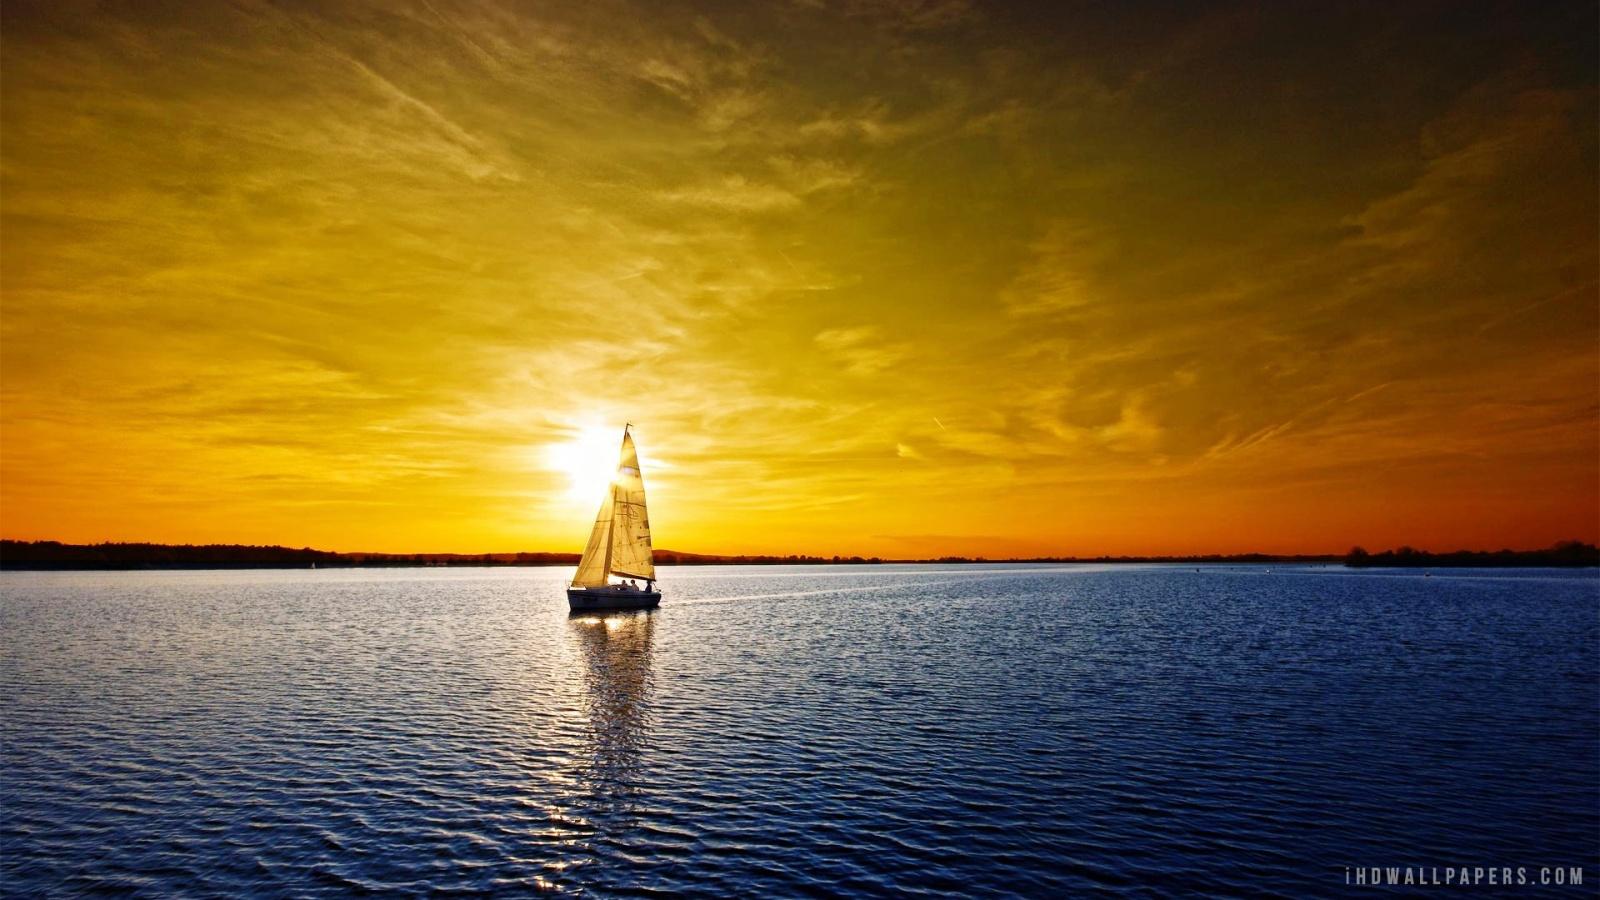 Sea Sundown Wallpaper